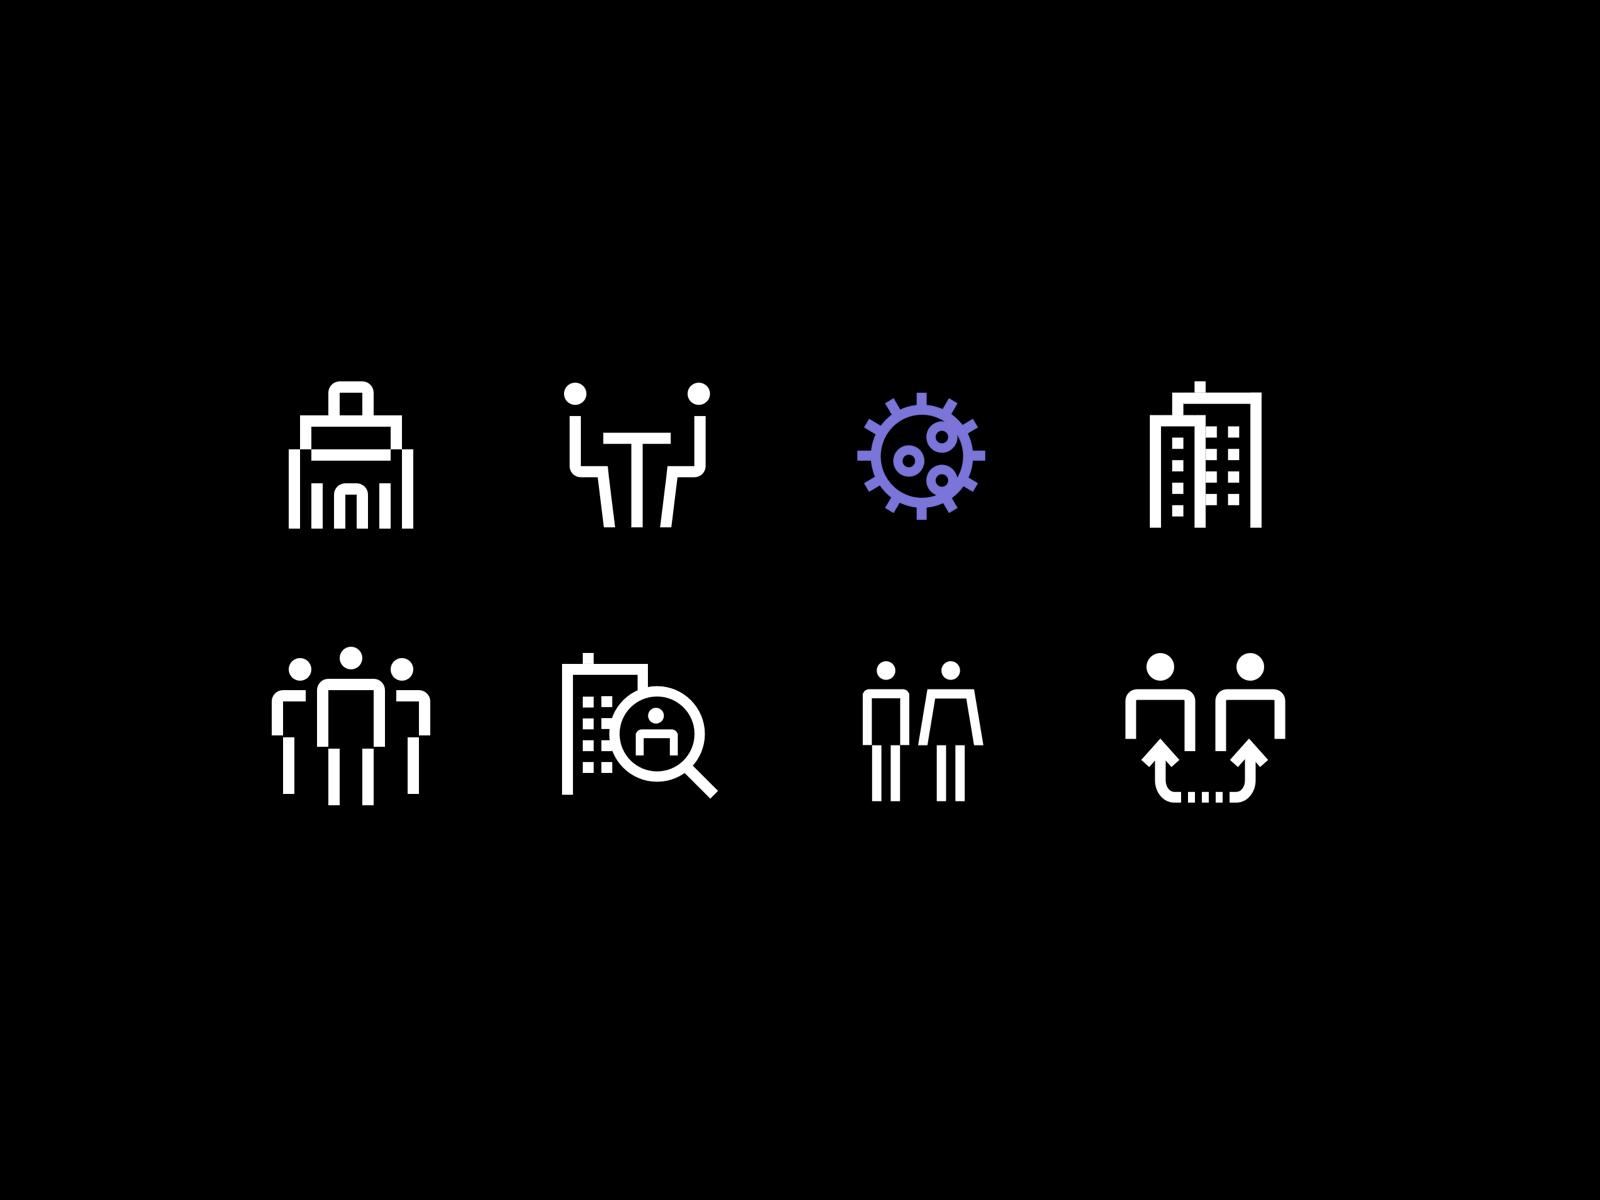 Pici icons